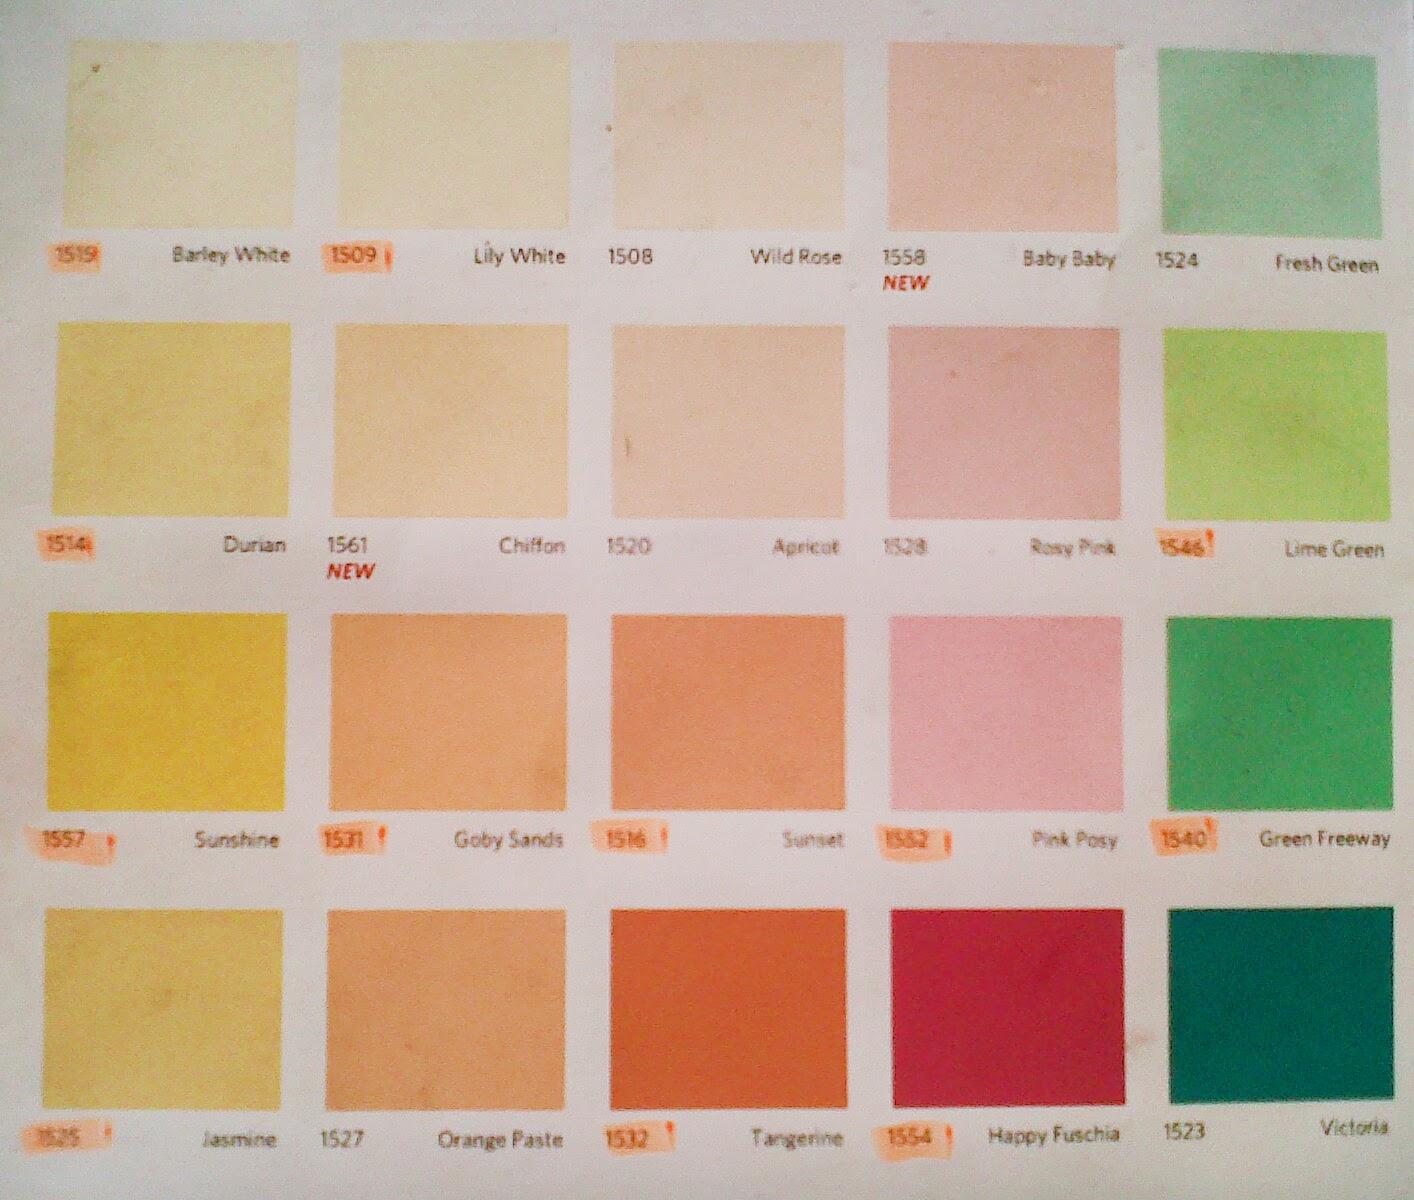 Katalog Warna Cat Tembok Vinilex – Modifikasi Sepeda Motor